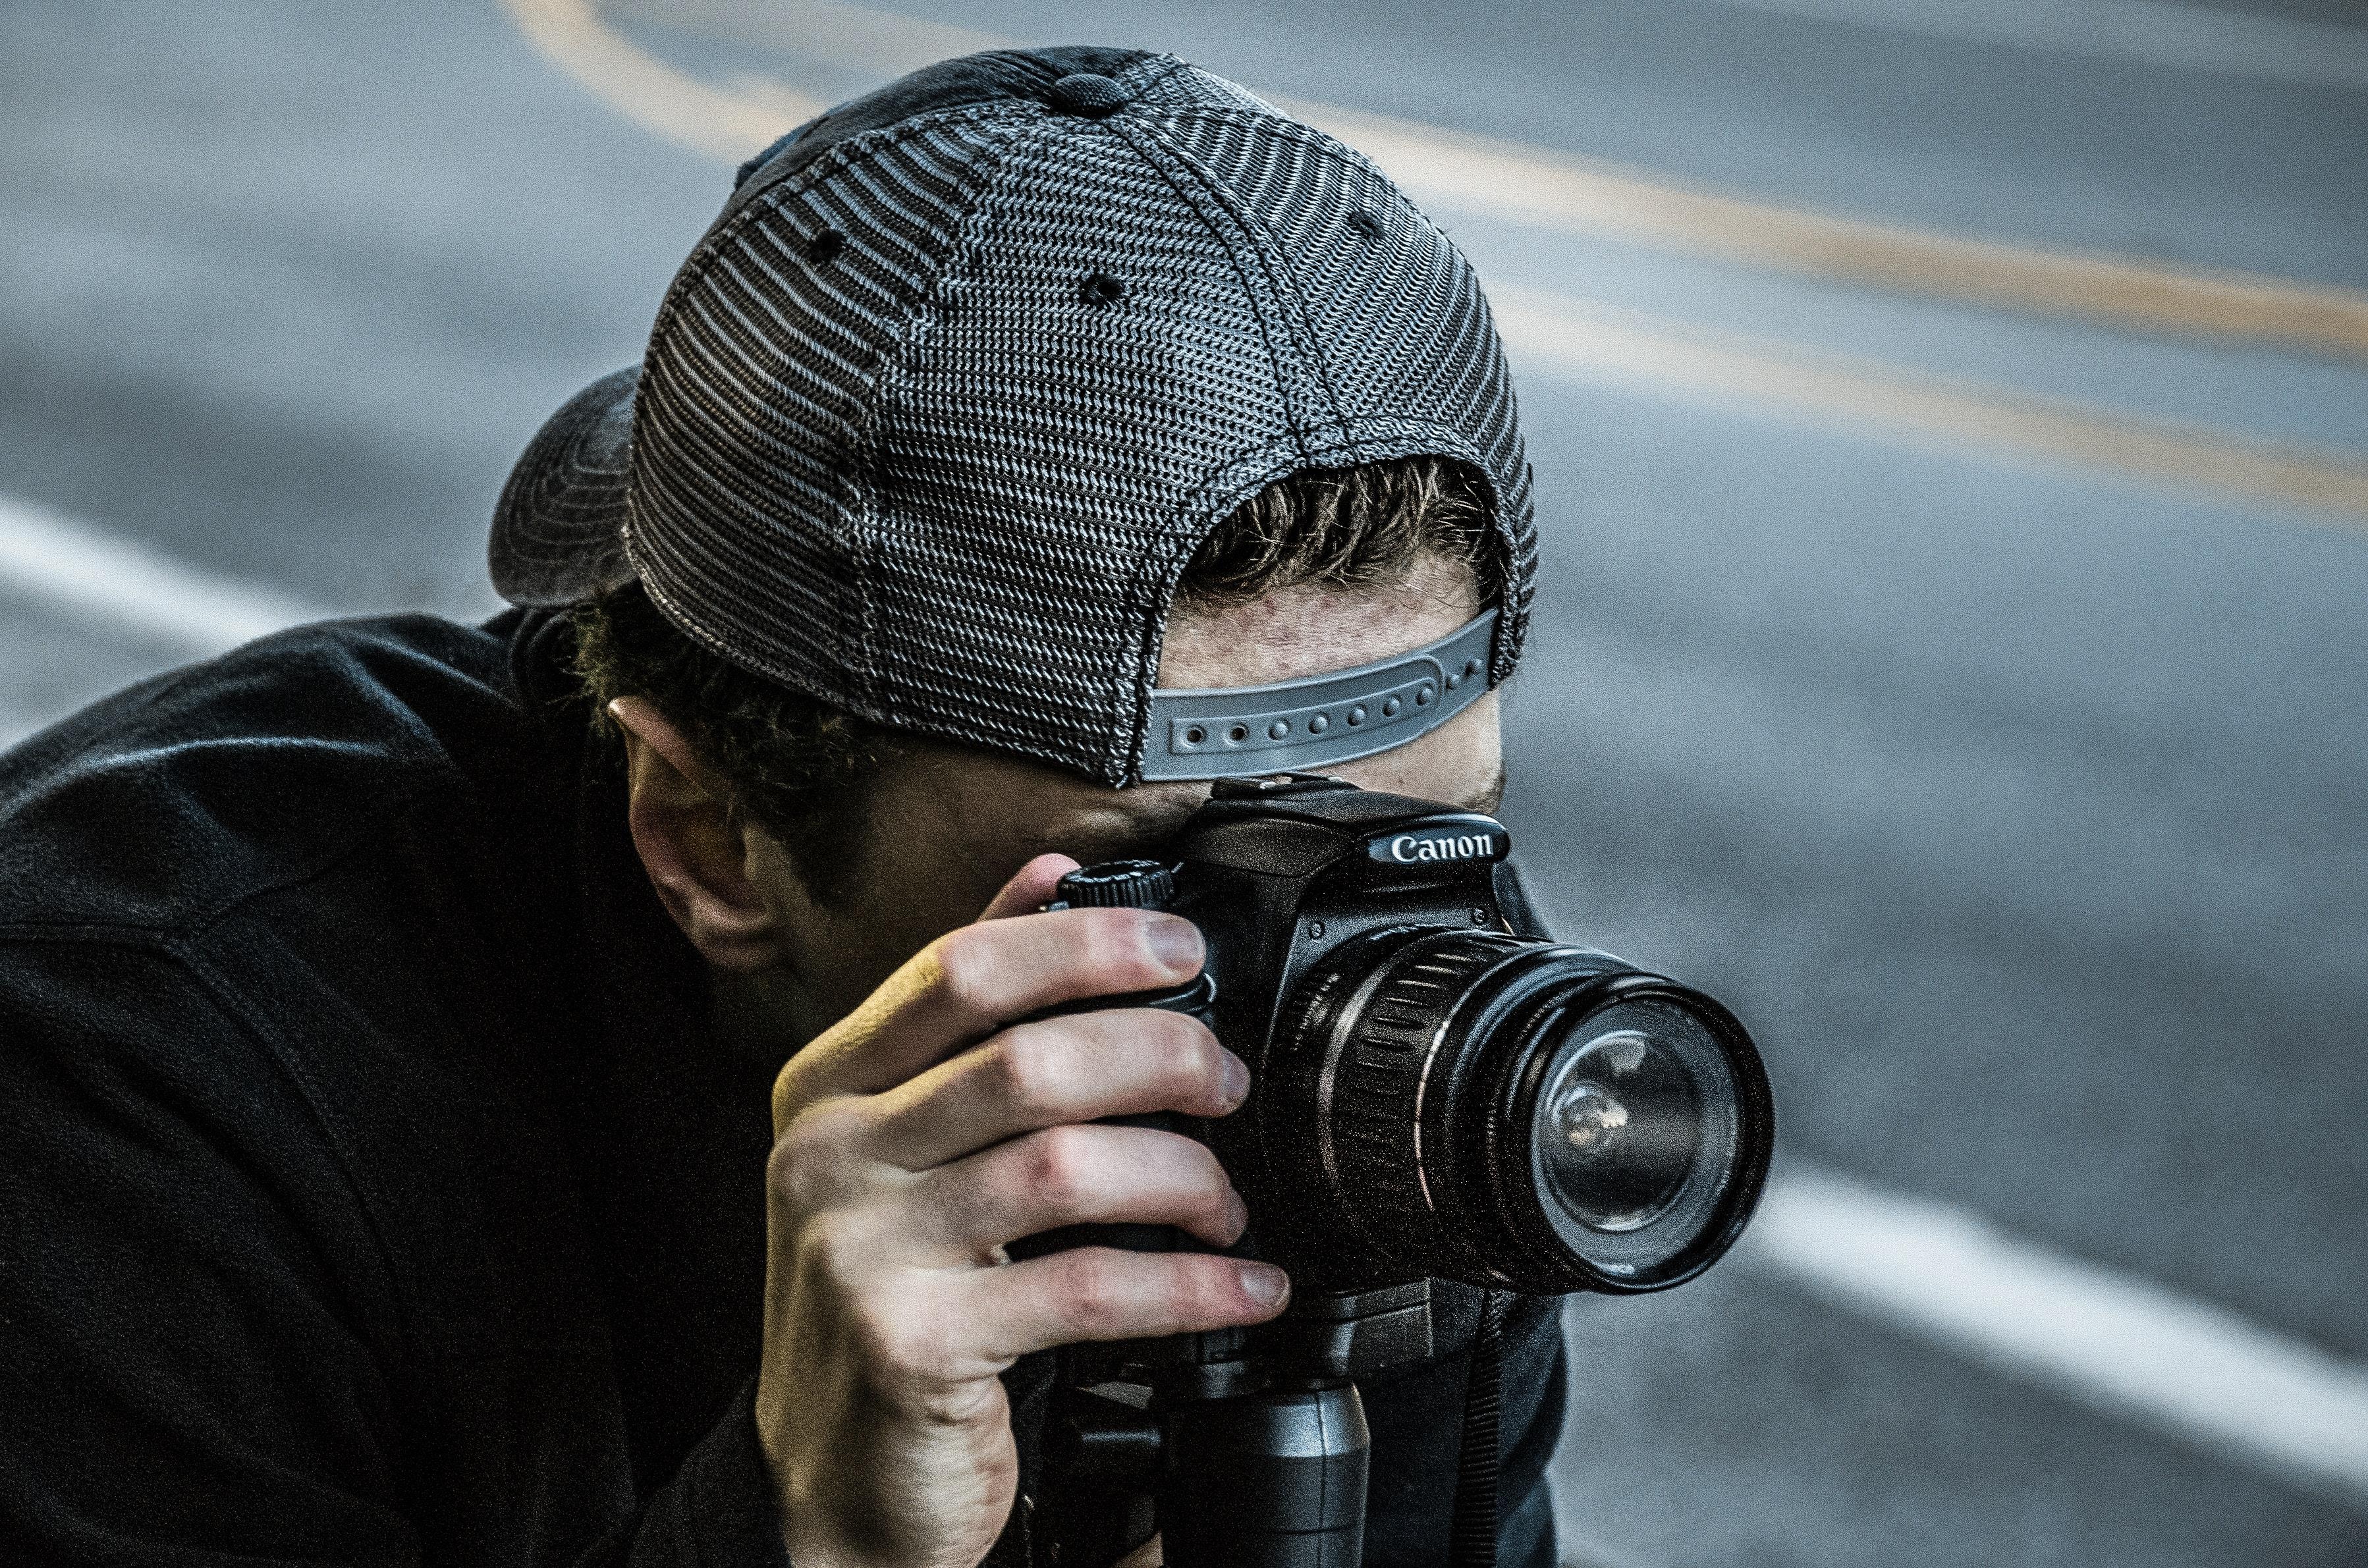 Man Taking Photo Using Black Canon DSLR Camera, Camera, Canon, Dslr, Hand, HQ Photo